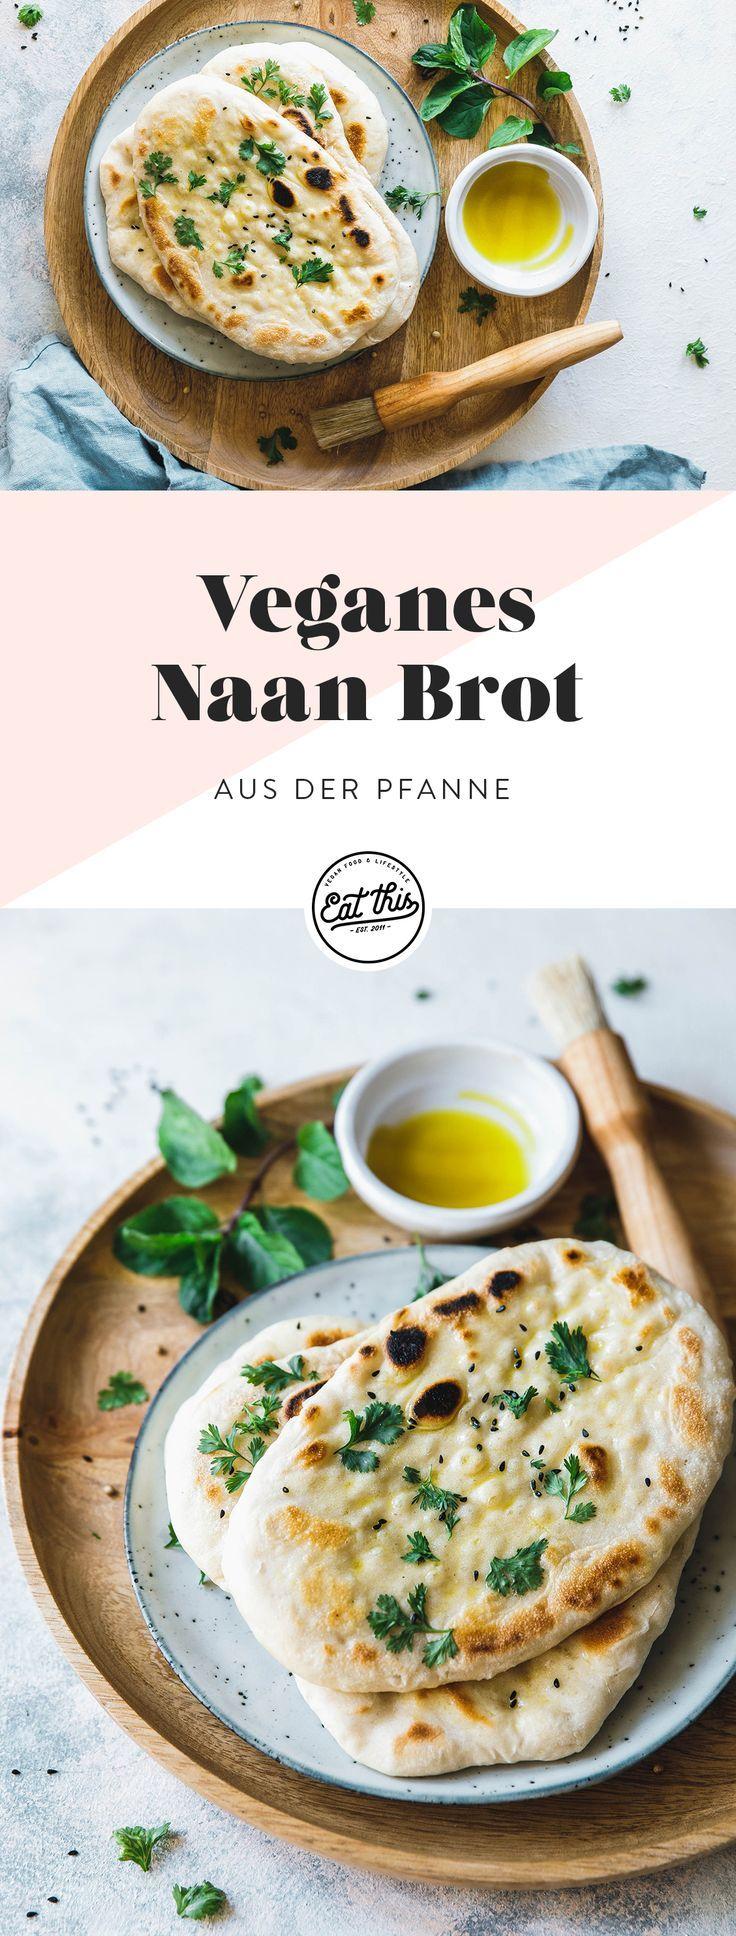 Veganes Naan Brot aus der Pfanne · Eat this! Foodblog • Vegane Rezepte • Stories #veganerezeptemittag